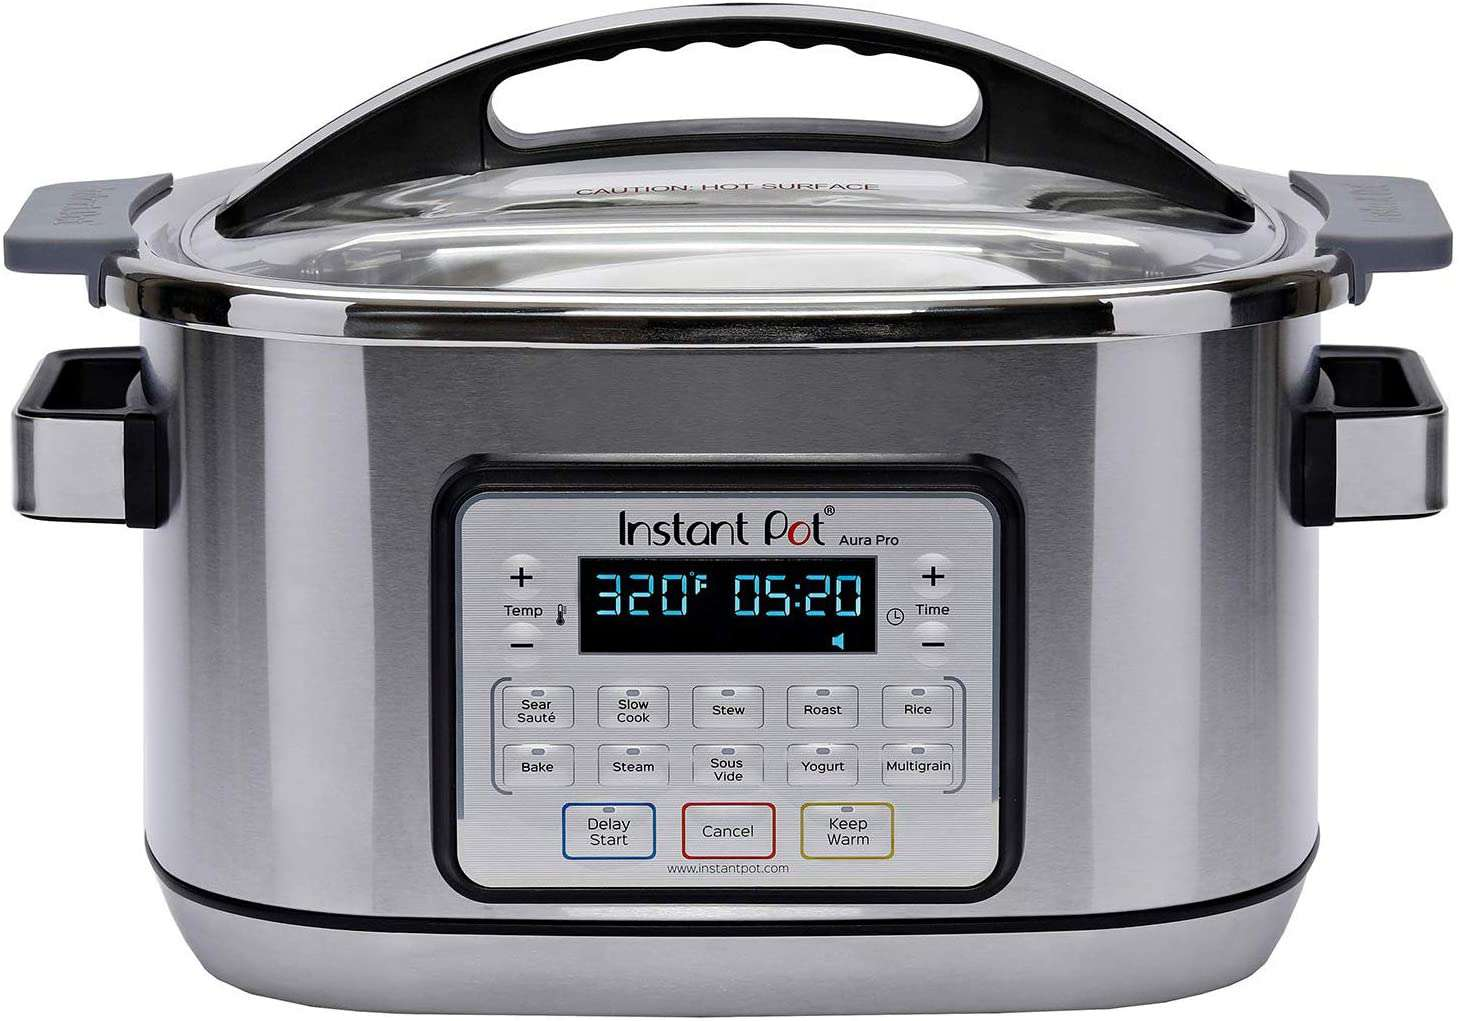 Instant Pot Aura Pro 11-in-1 Multicooker Slow Cooker